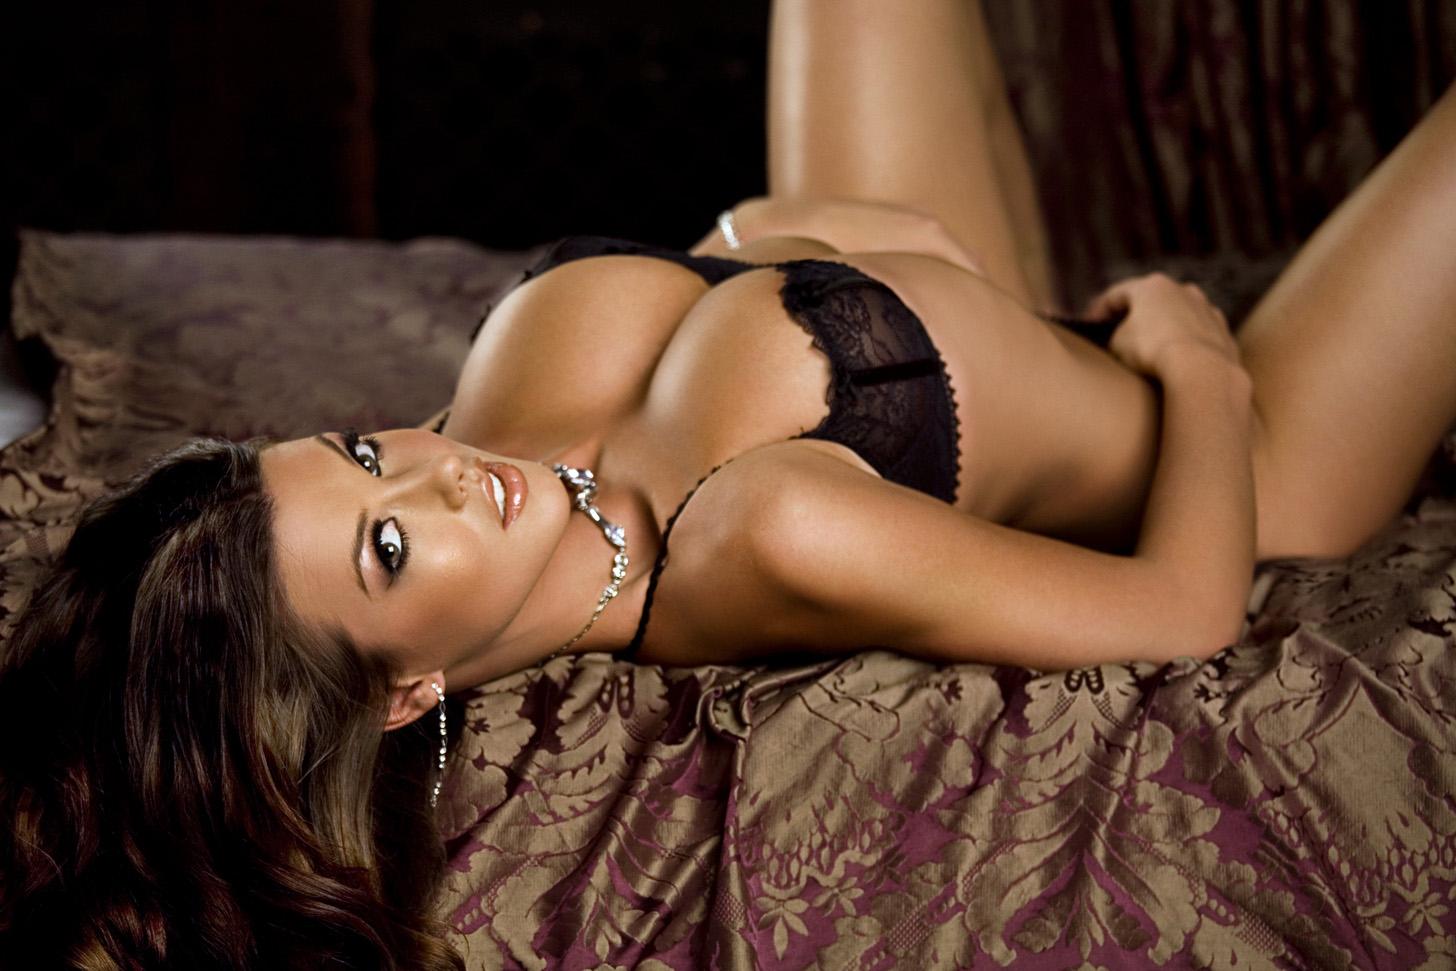 sexy undertøy dame latex undertøy